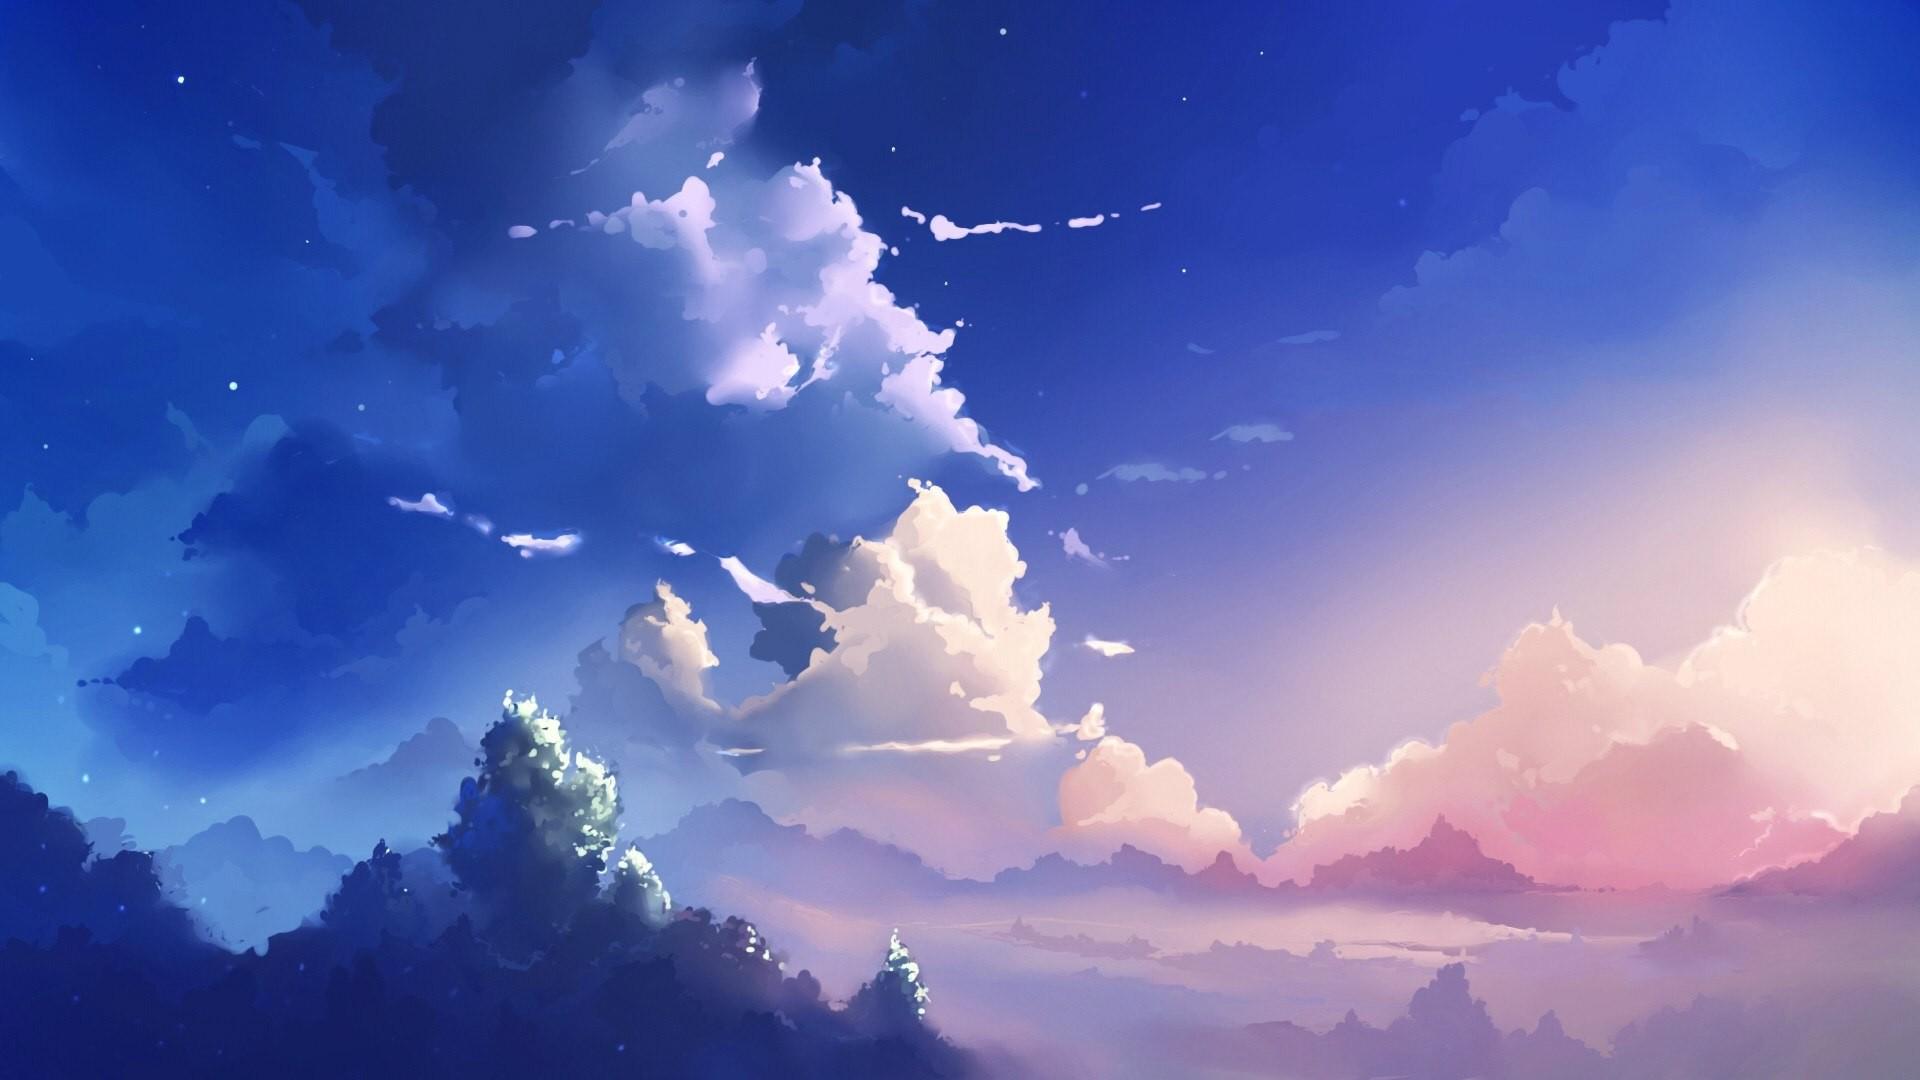 228711 dark anime background scenery 1920x1080 for samsung